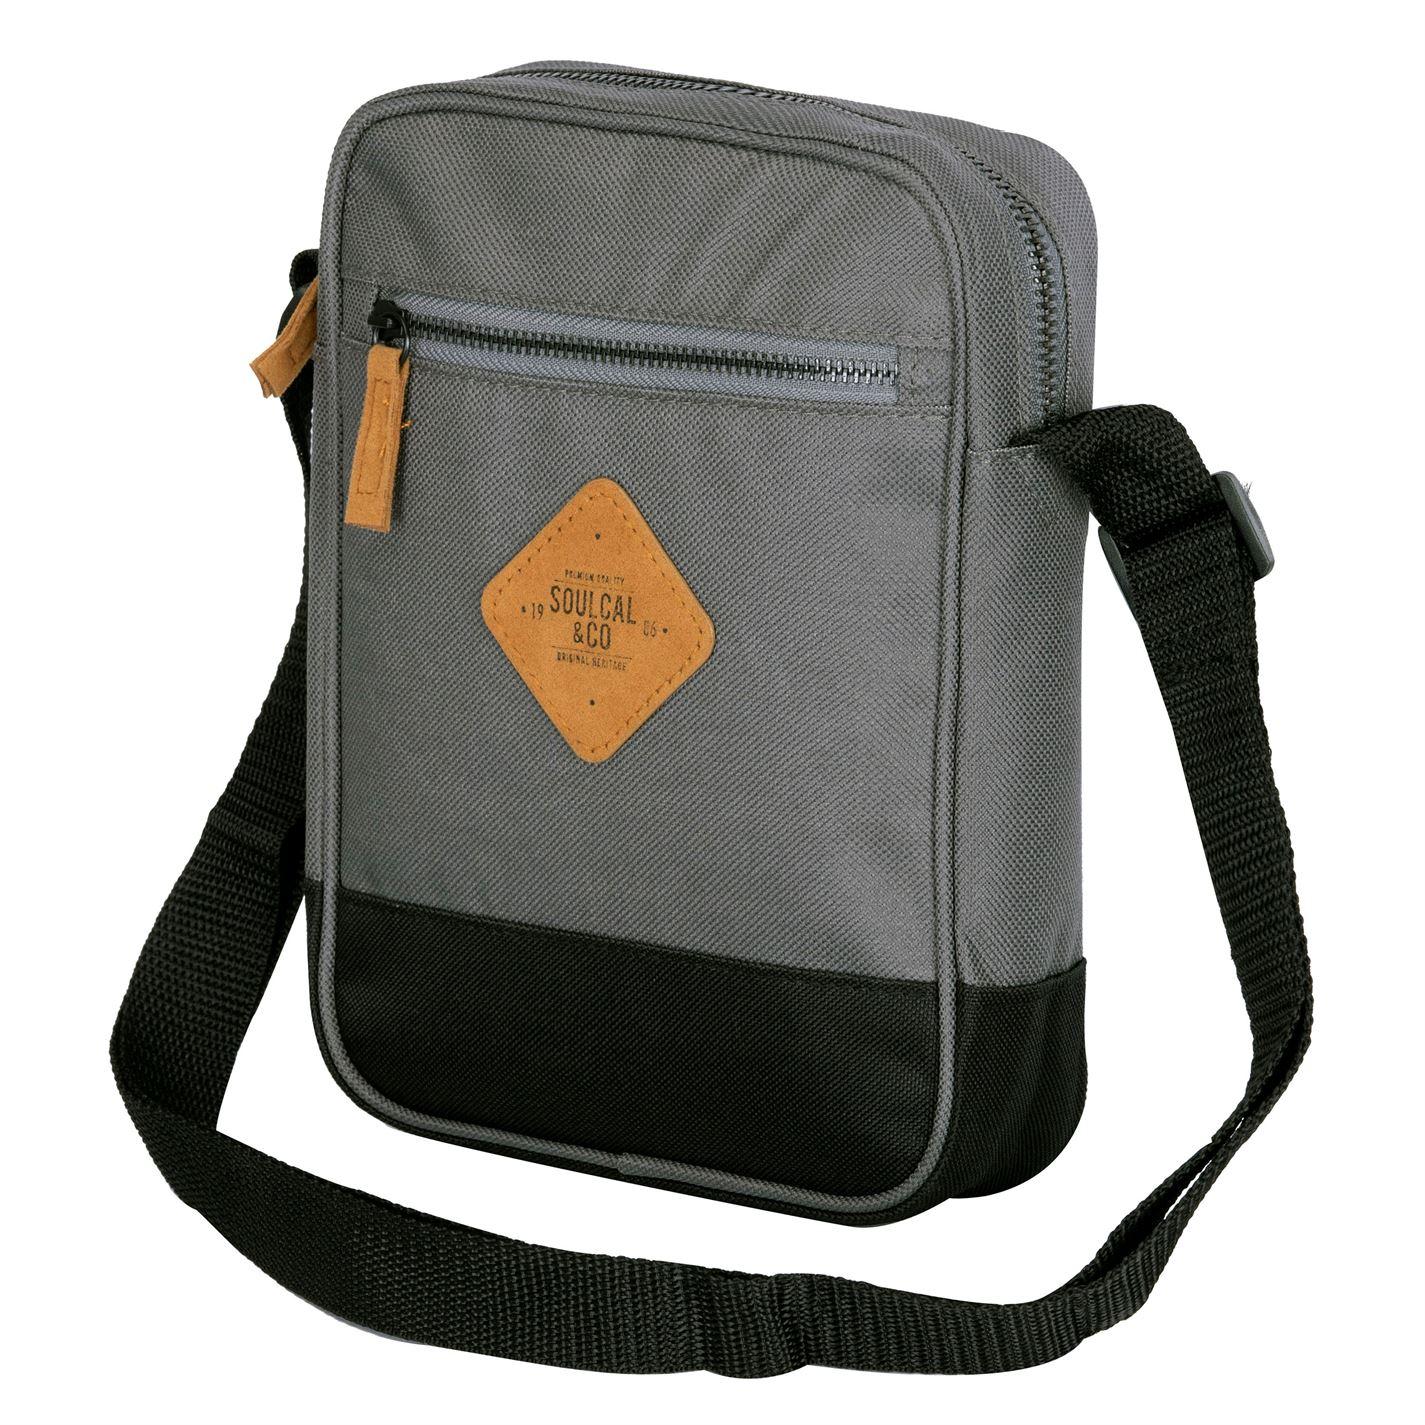 Unisex-SoulCal-Mini-Gadget-Bag-Zip-New thumbnail 6